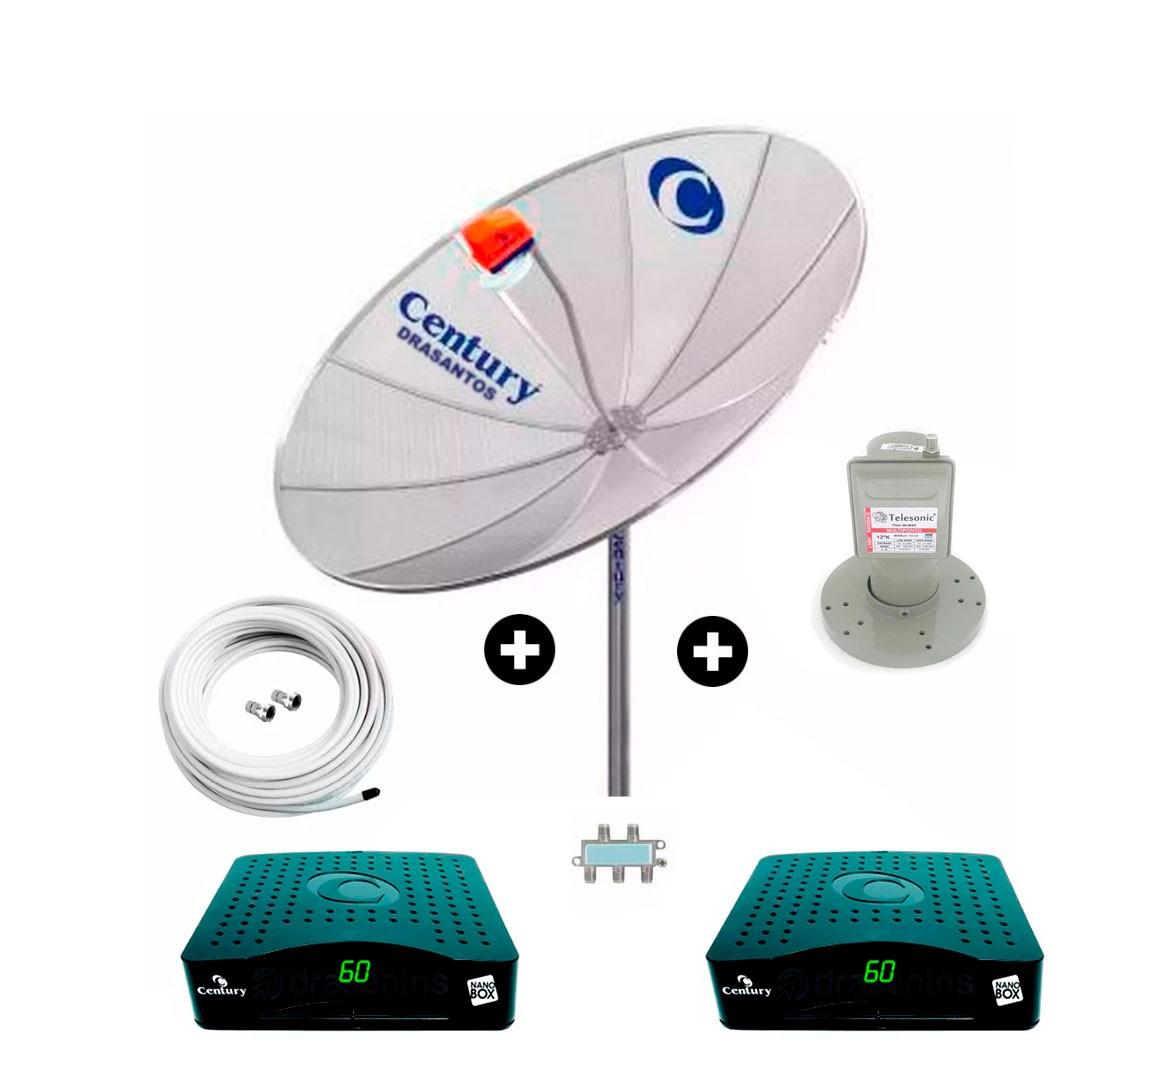 Antena Parabolica Century 170cm + 2 Receptor + Mult + Cabo